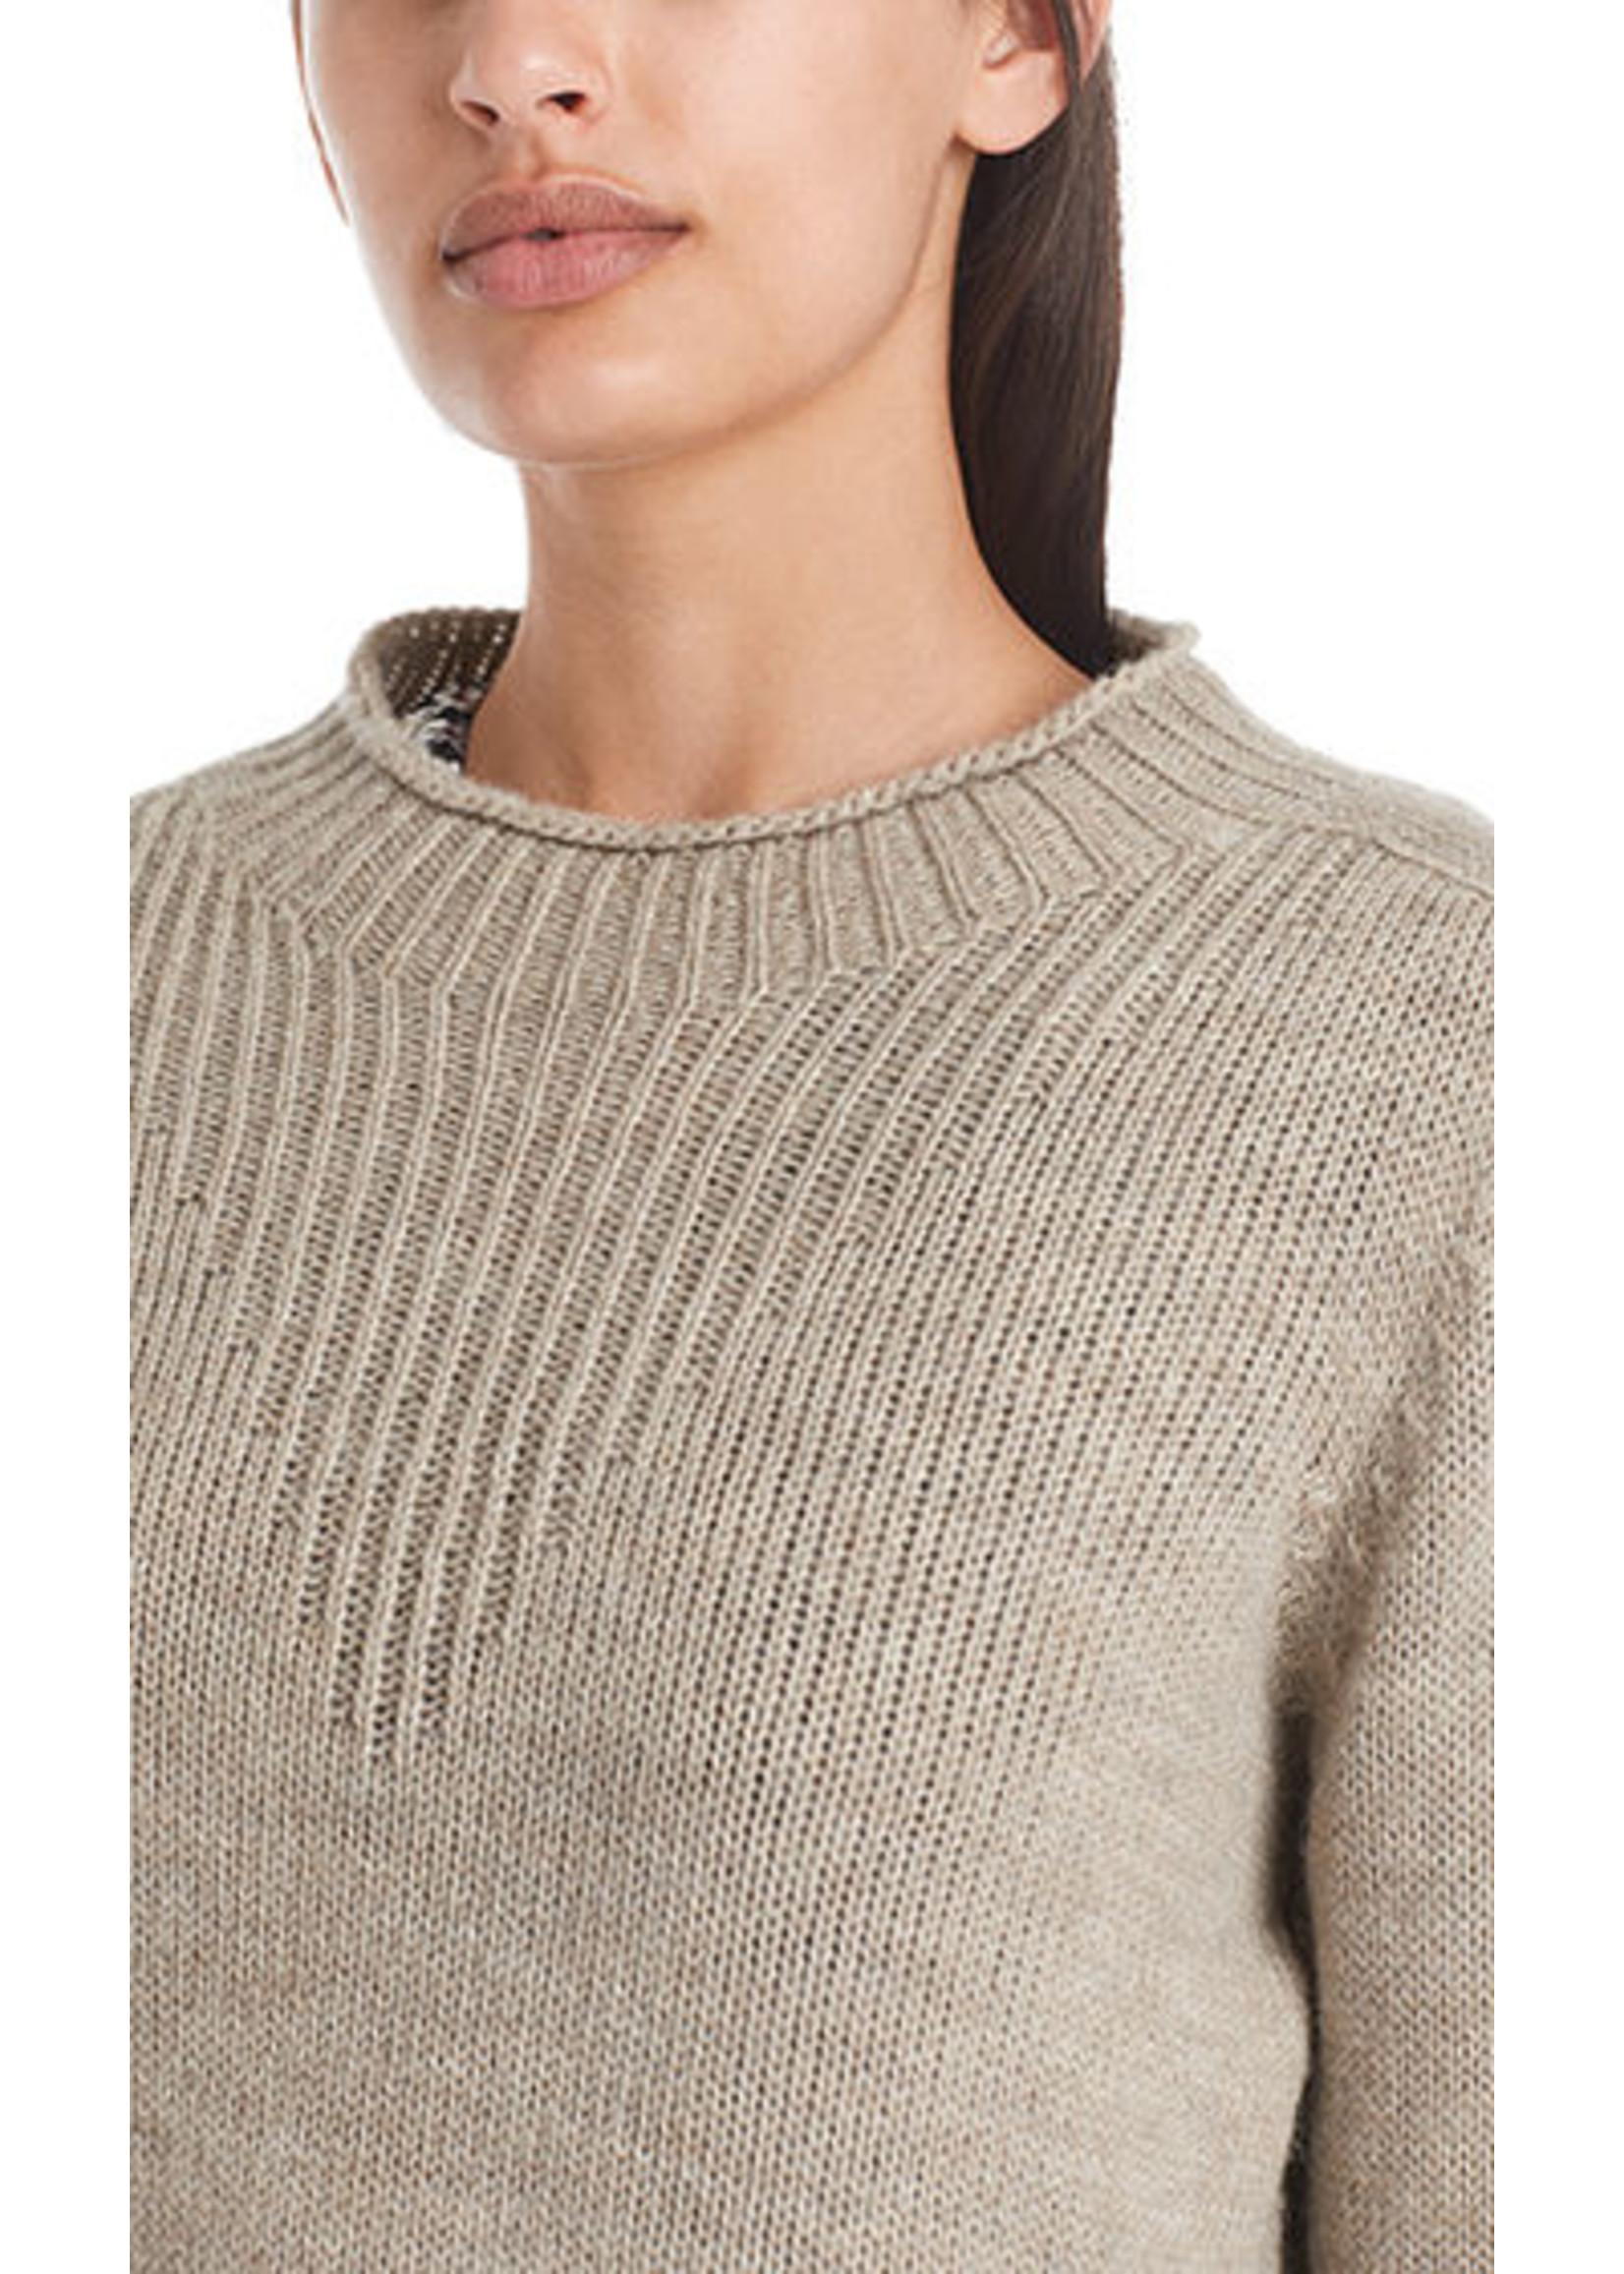 Sweater RC 41.57 M18 linen